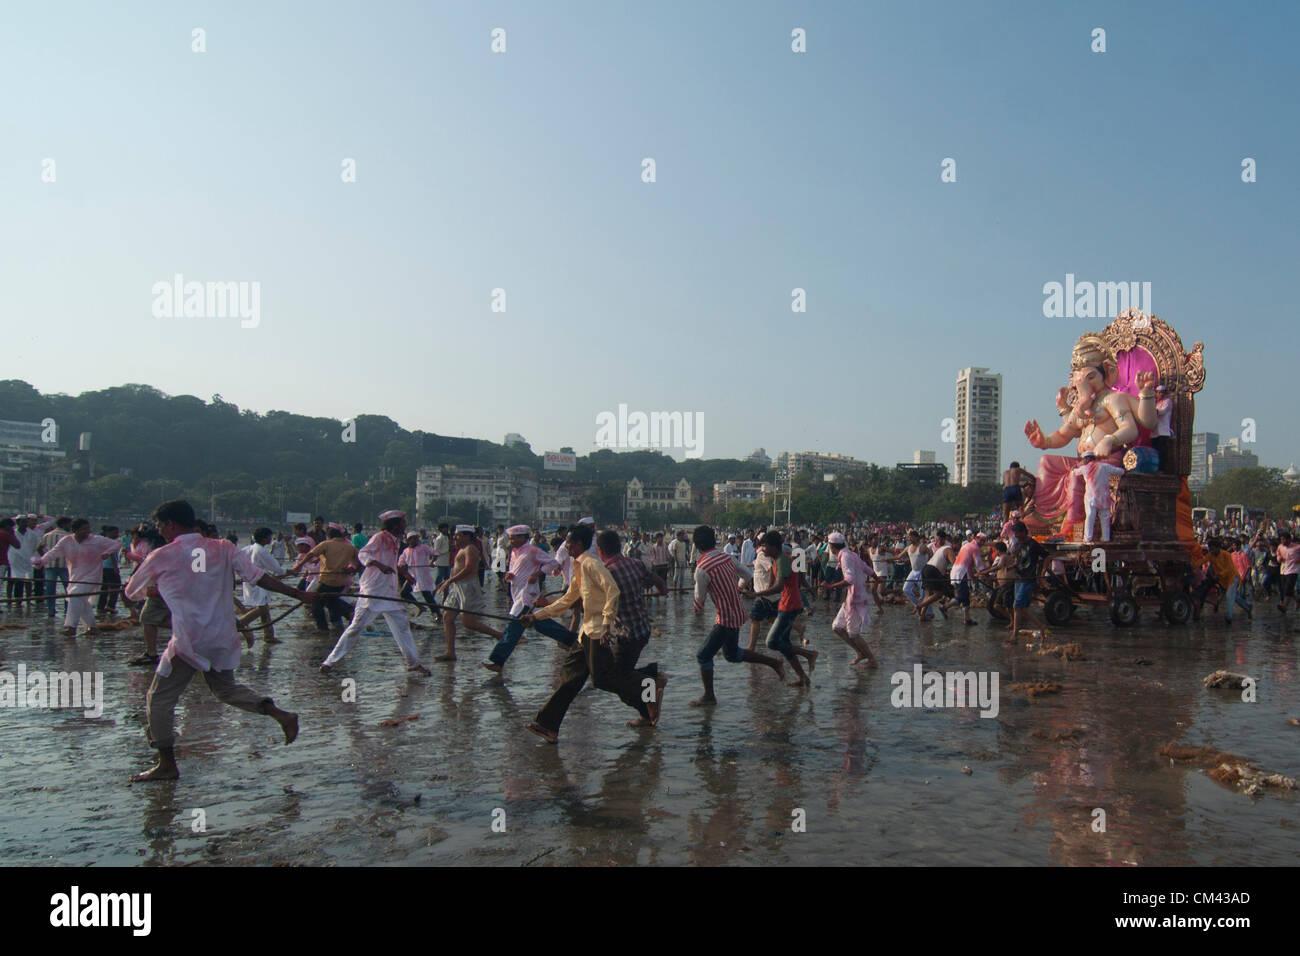 incontri signore a Mumbai datazione Craigslist sicuro